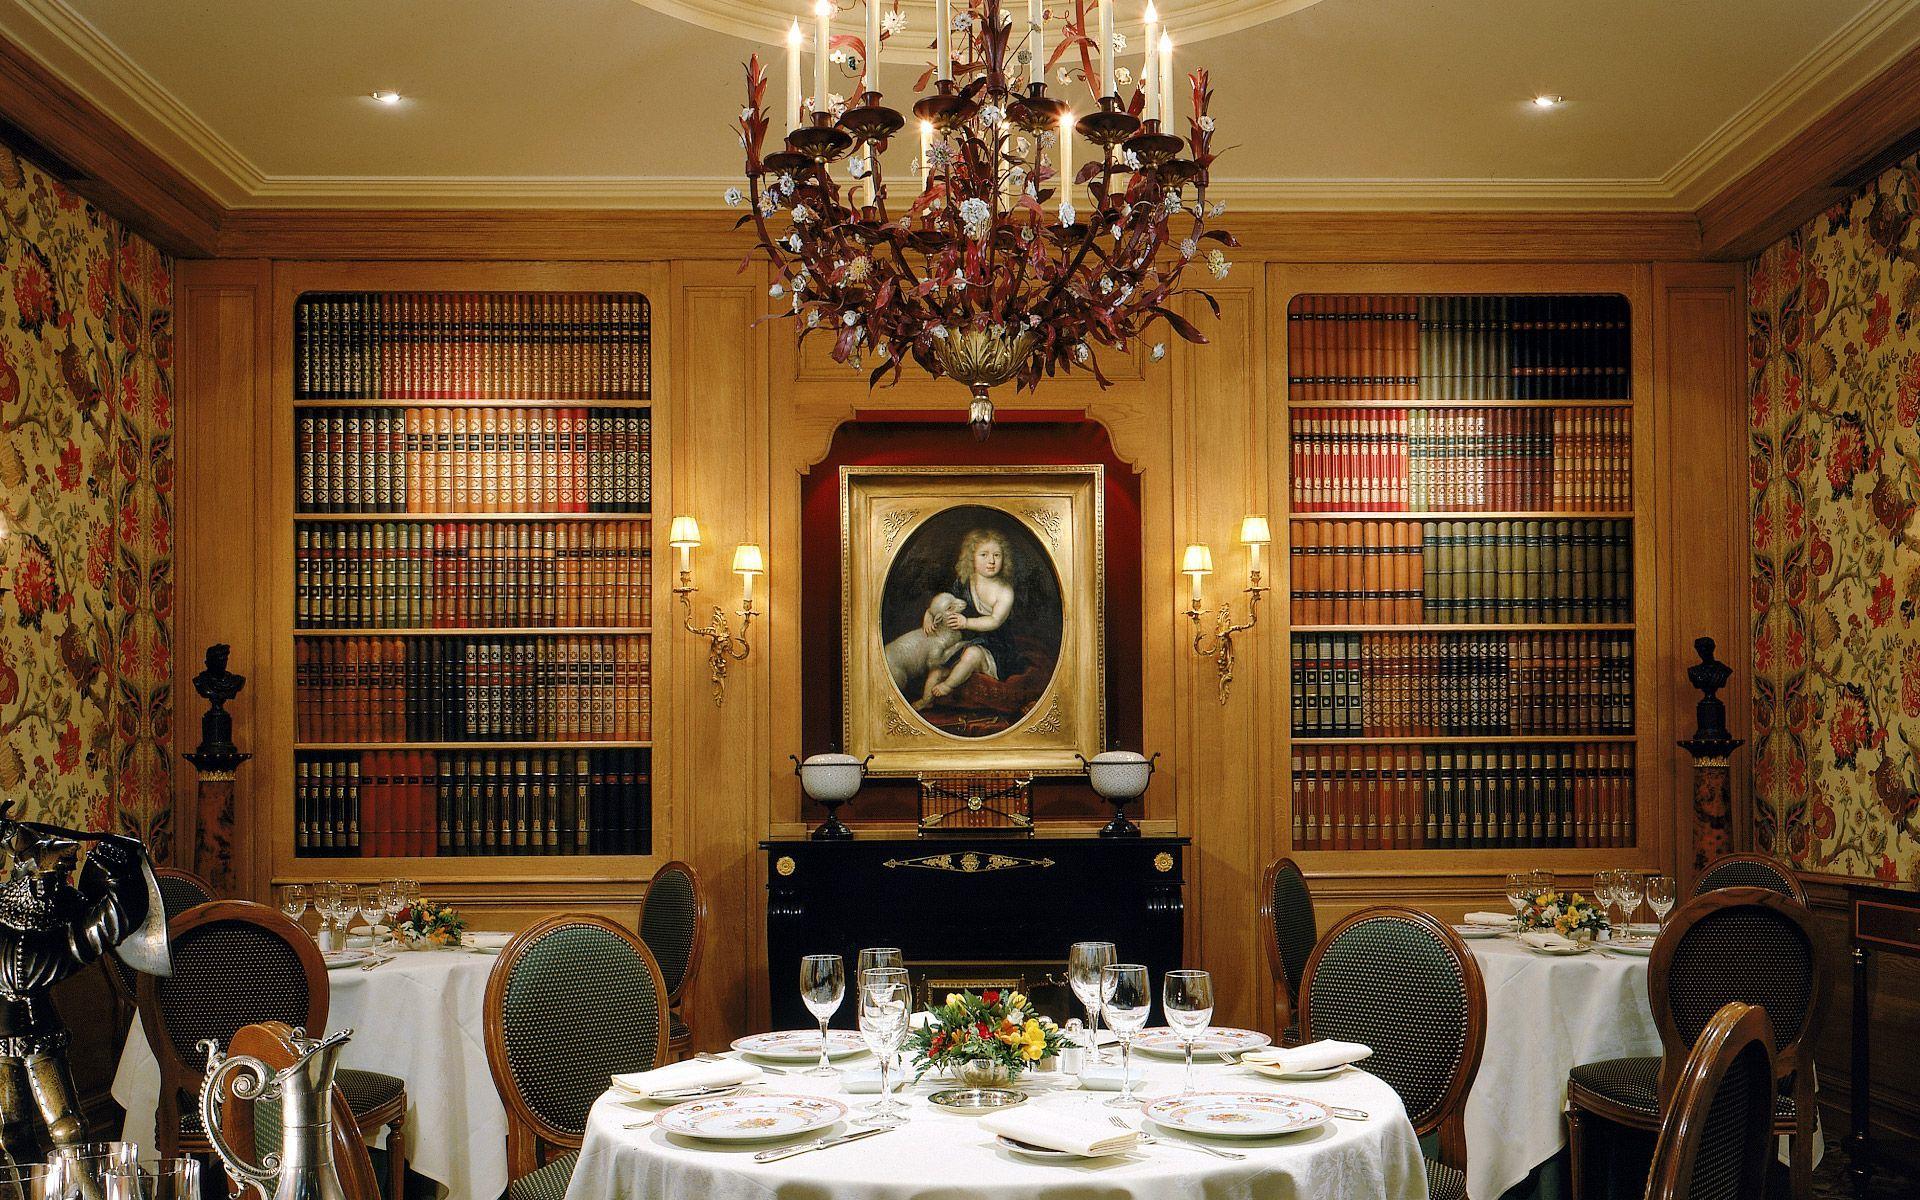 http://luxe.planet.fr/wp-content/uploads/2012/08/Restaurant-Hotel-San-Regis-Paris.jpg